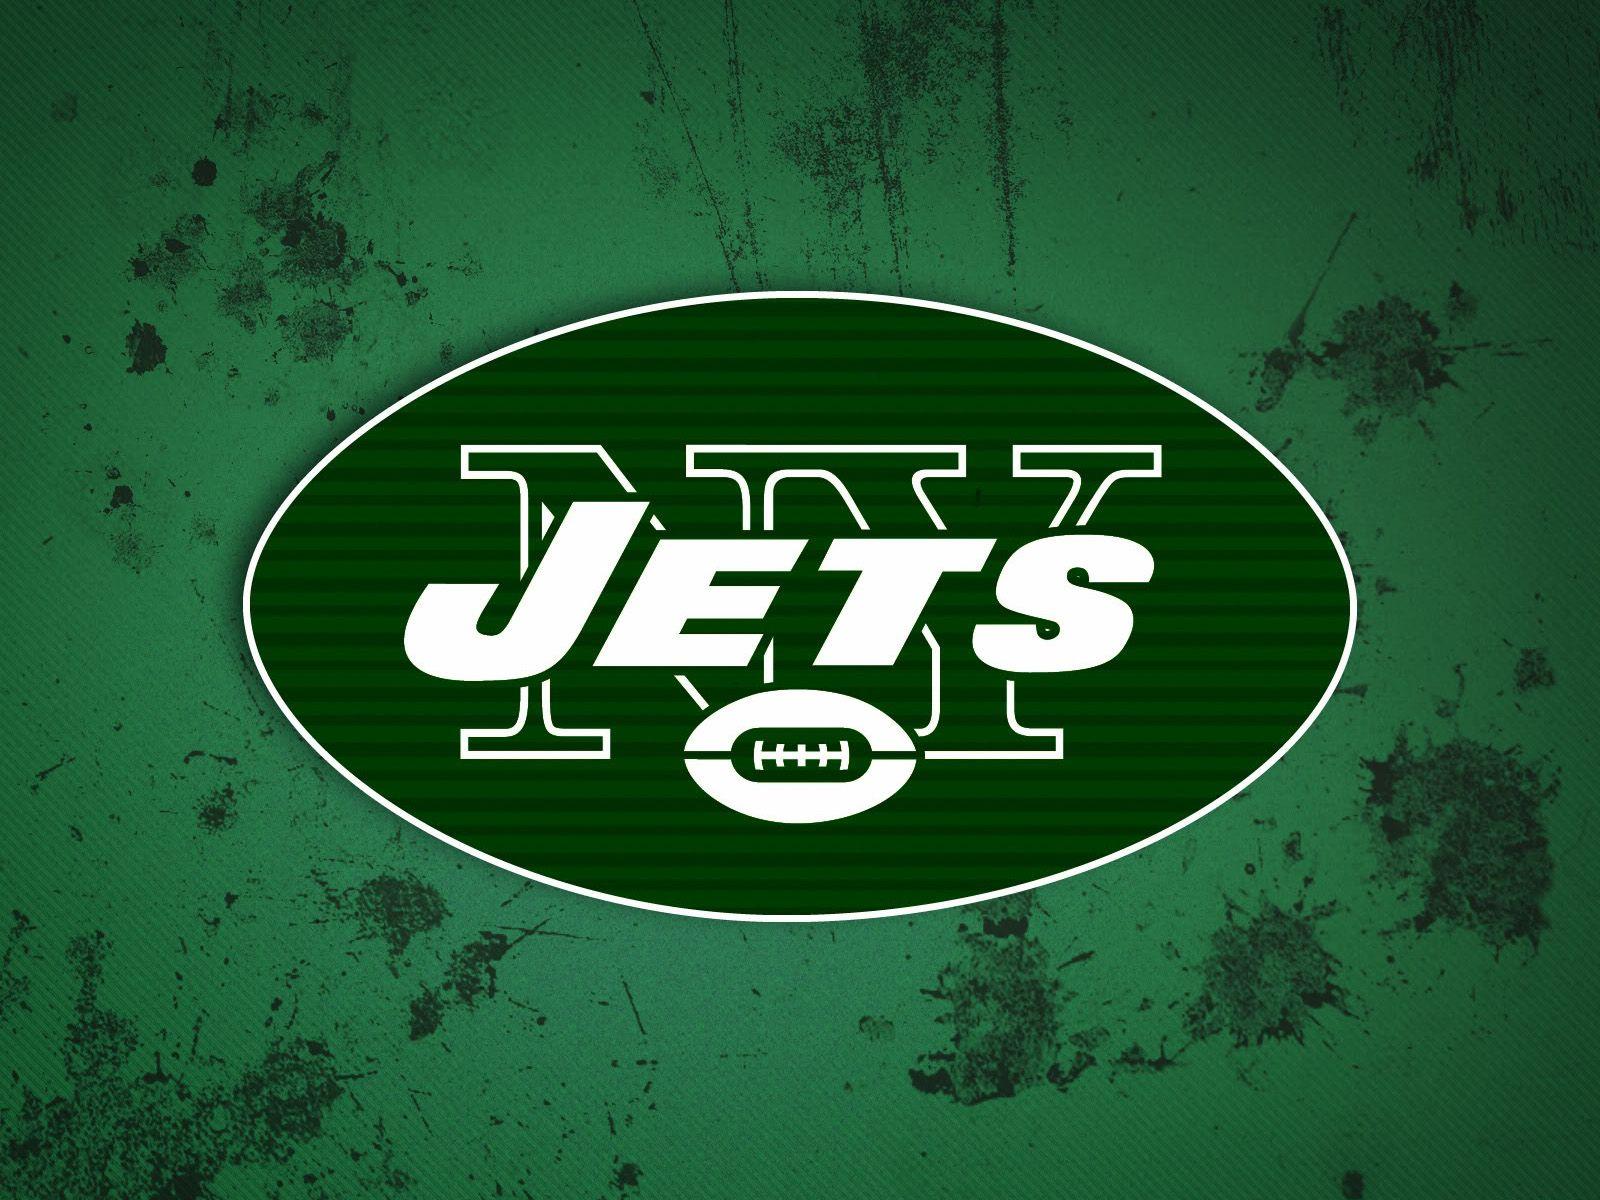 Ny Jets Computer Wallpaper Wallpapers 2020 New York Jets Nfl Football Wallpaper Ny Jets